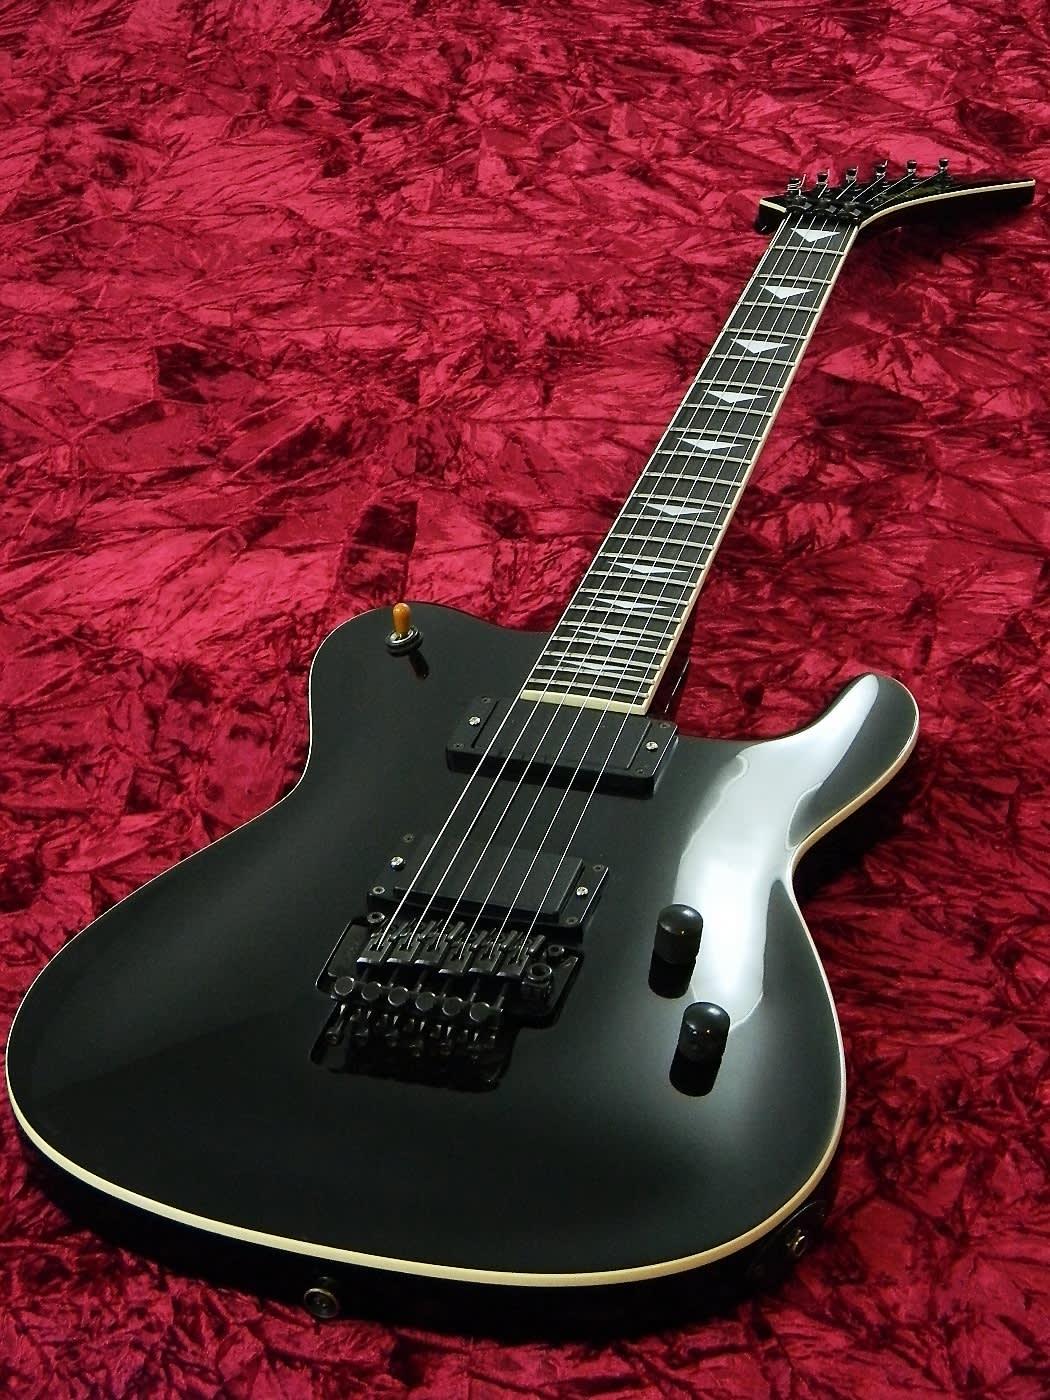 Auto Body Shops >> Barrington BRG 874 Archtop Black Tele Body Guitar Gotoh Floyd | Reverb